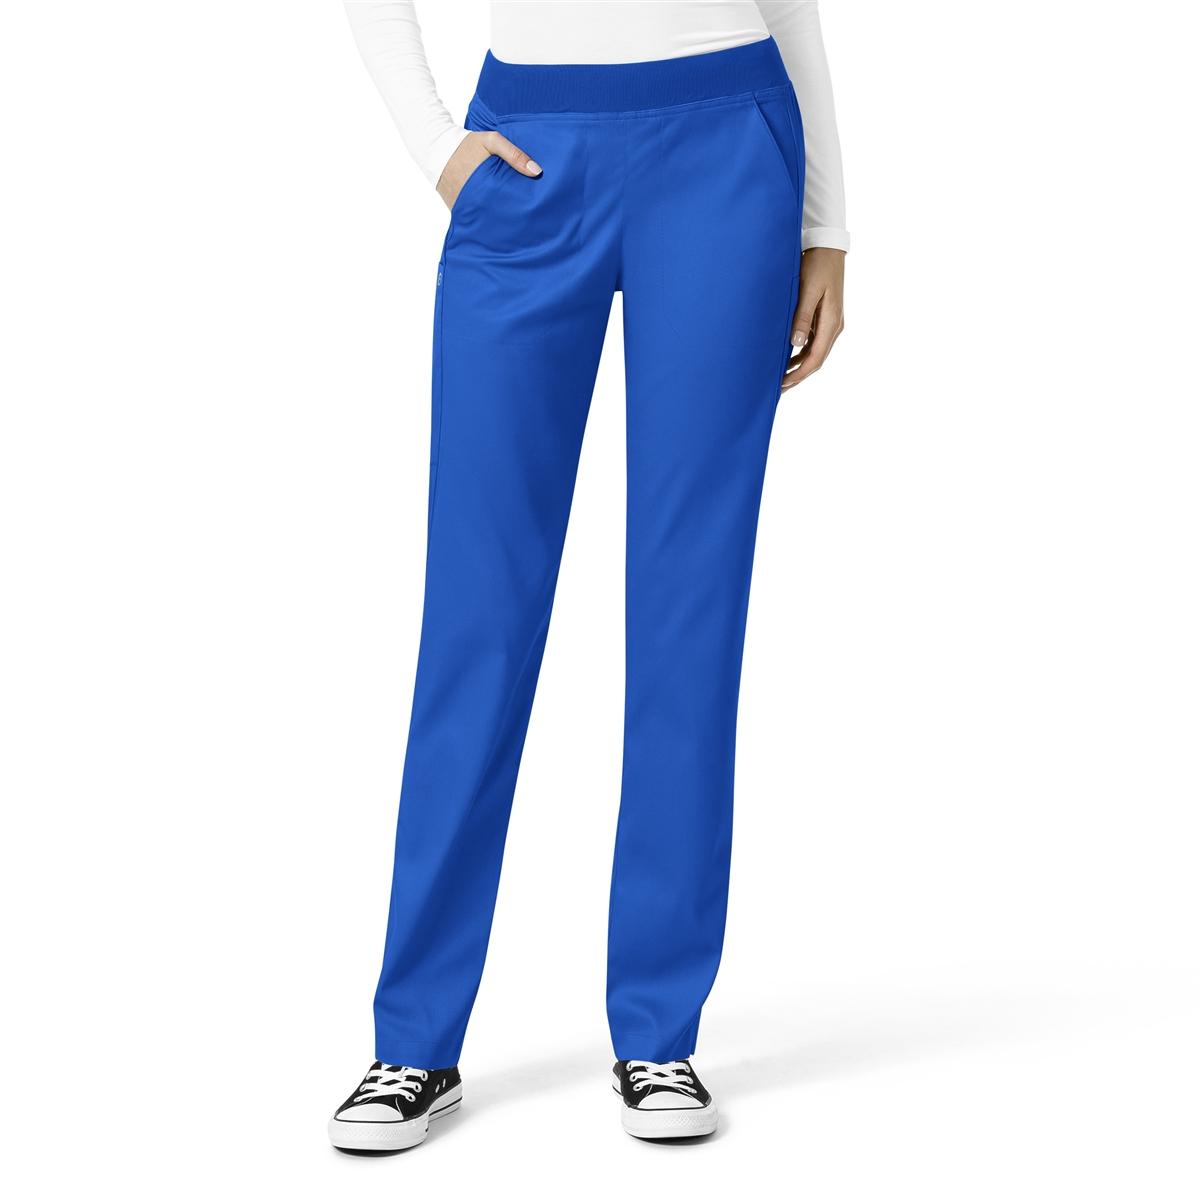 f4f6c0b0a79 PRO Women's Knit Waist Cargo Pant - WonderWink Scrubs